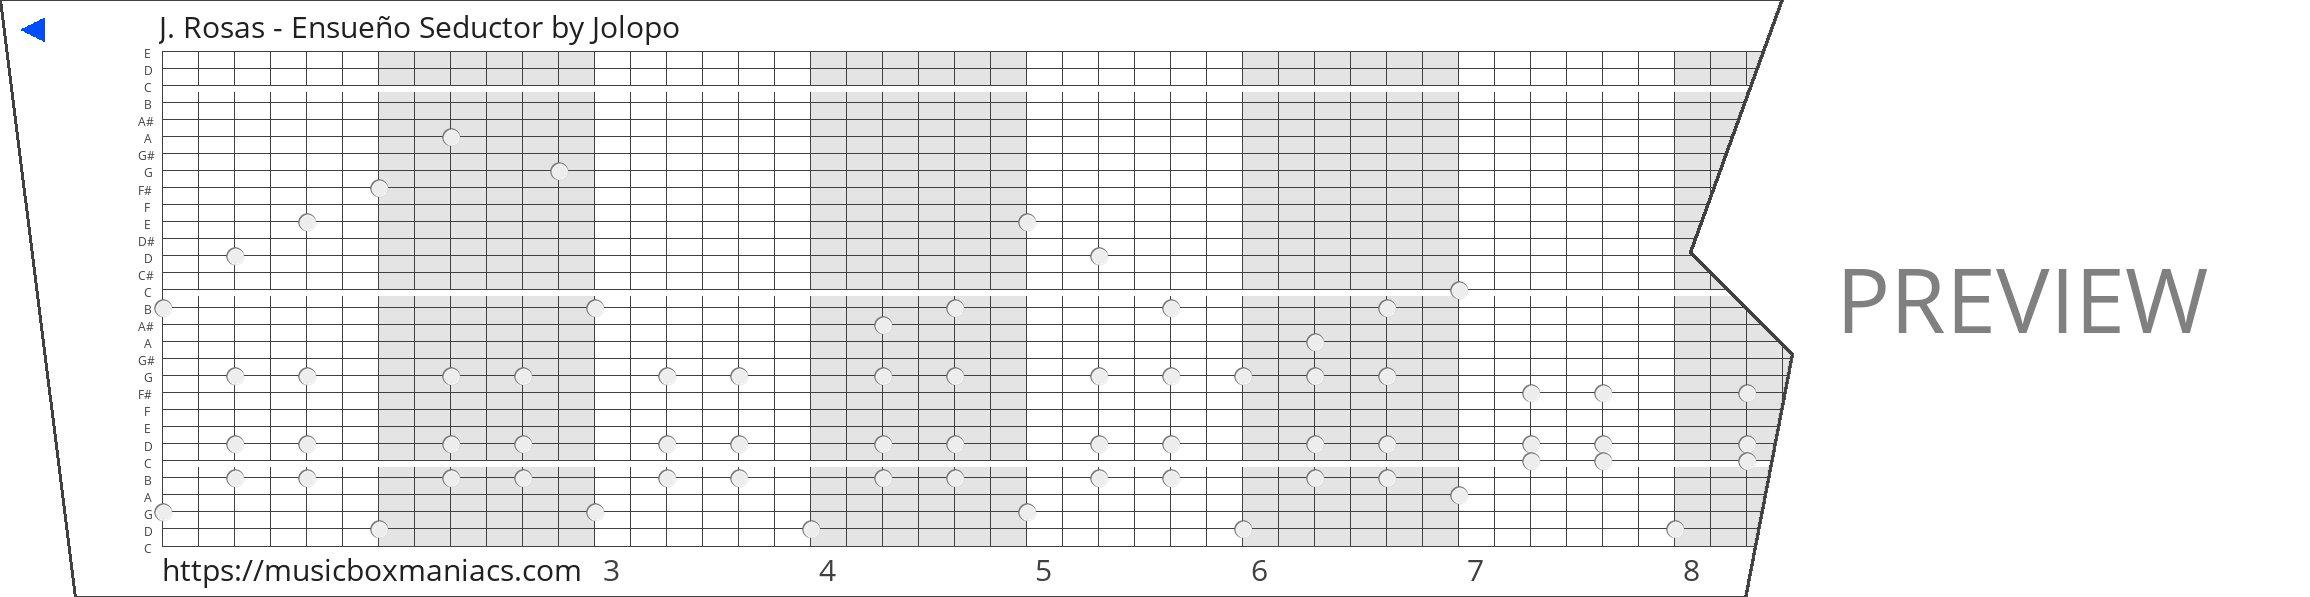 J. Rosas - Ensueño Seductor 30 note music box paper strip